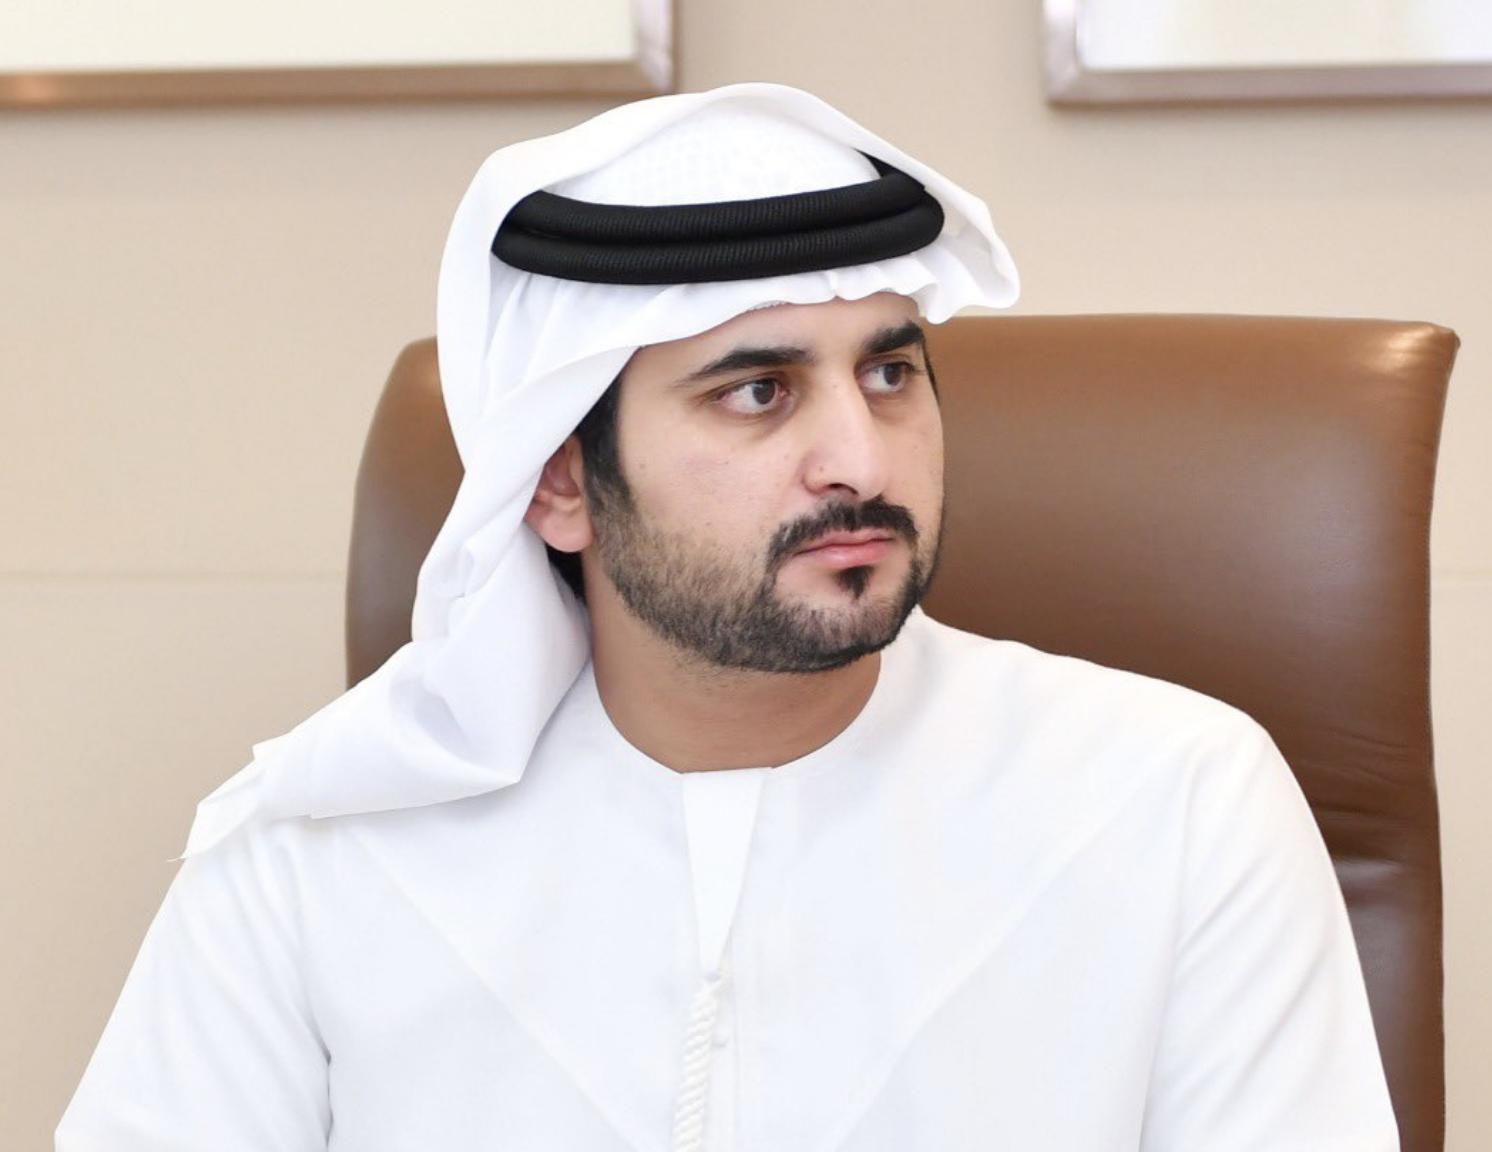 UAE: Sheikh Maktoum is new Minister of Finance and Deputy Prime Minister